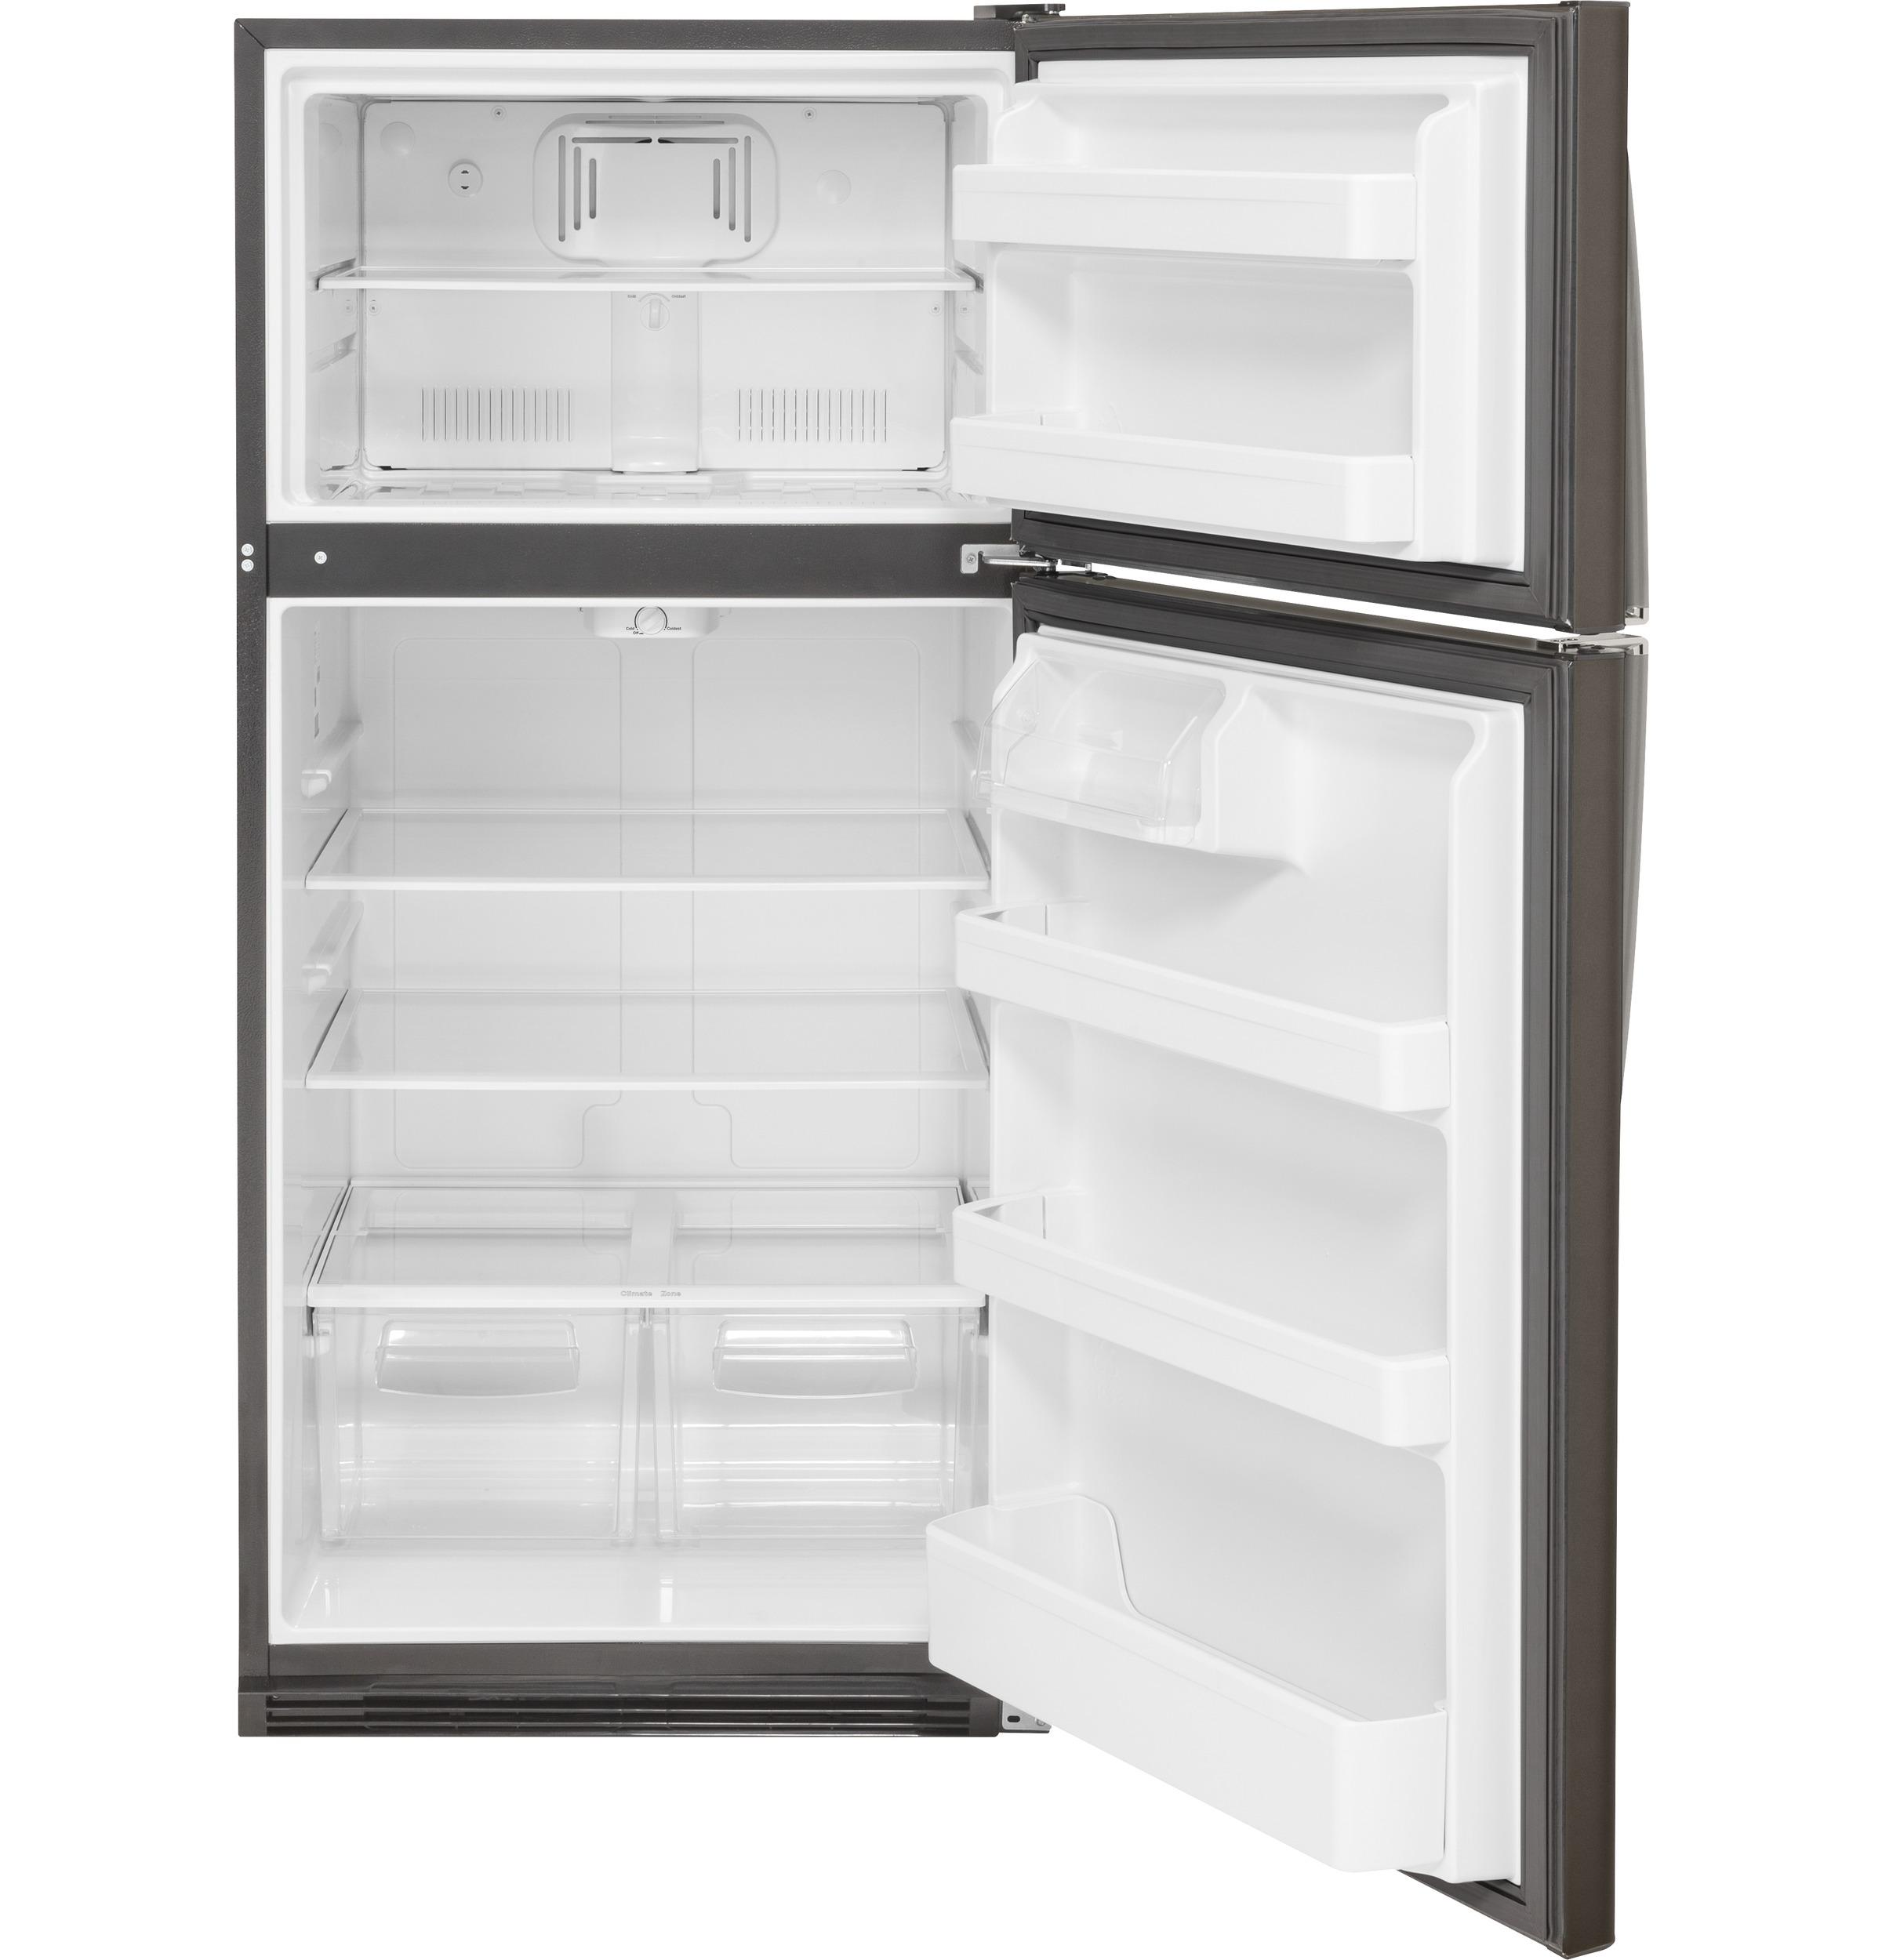 Model: GTS21FMKES | GE GE® 20.8 Cu. Ft. Top-Freezer Refrigerator